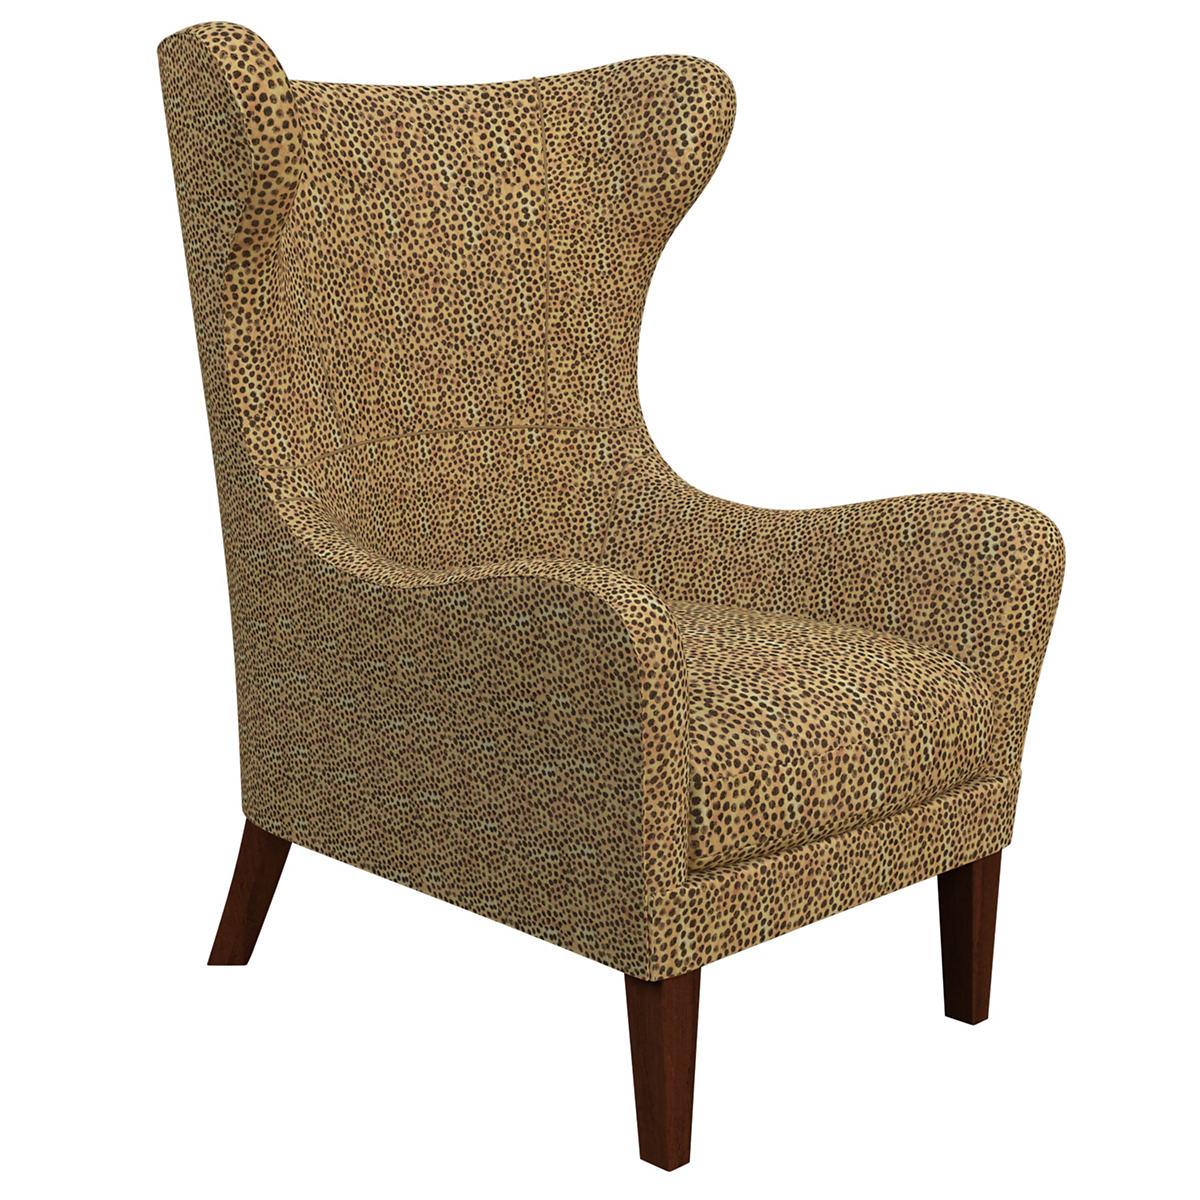 Cheetah Linen Mirage Tobacco Chair